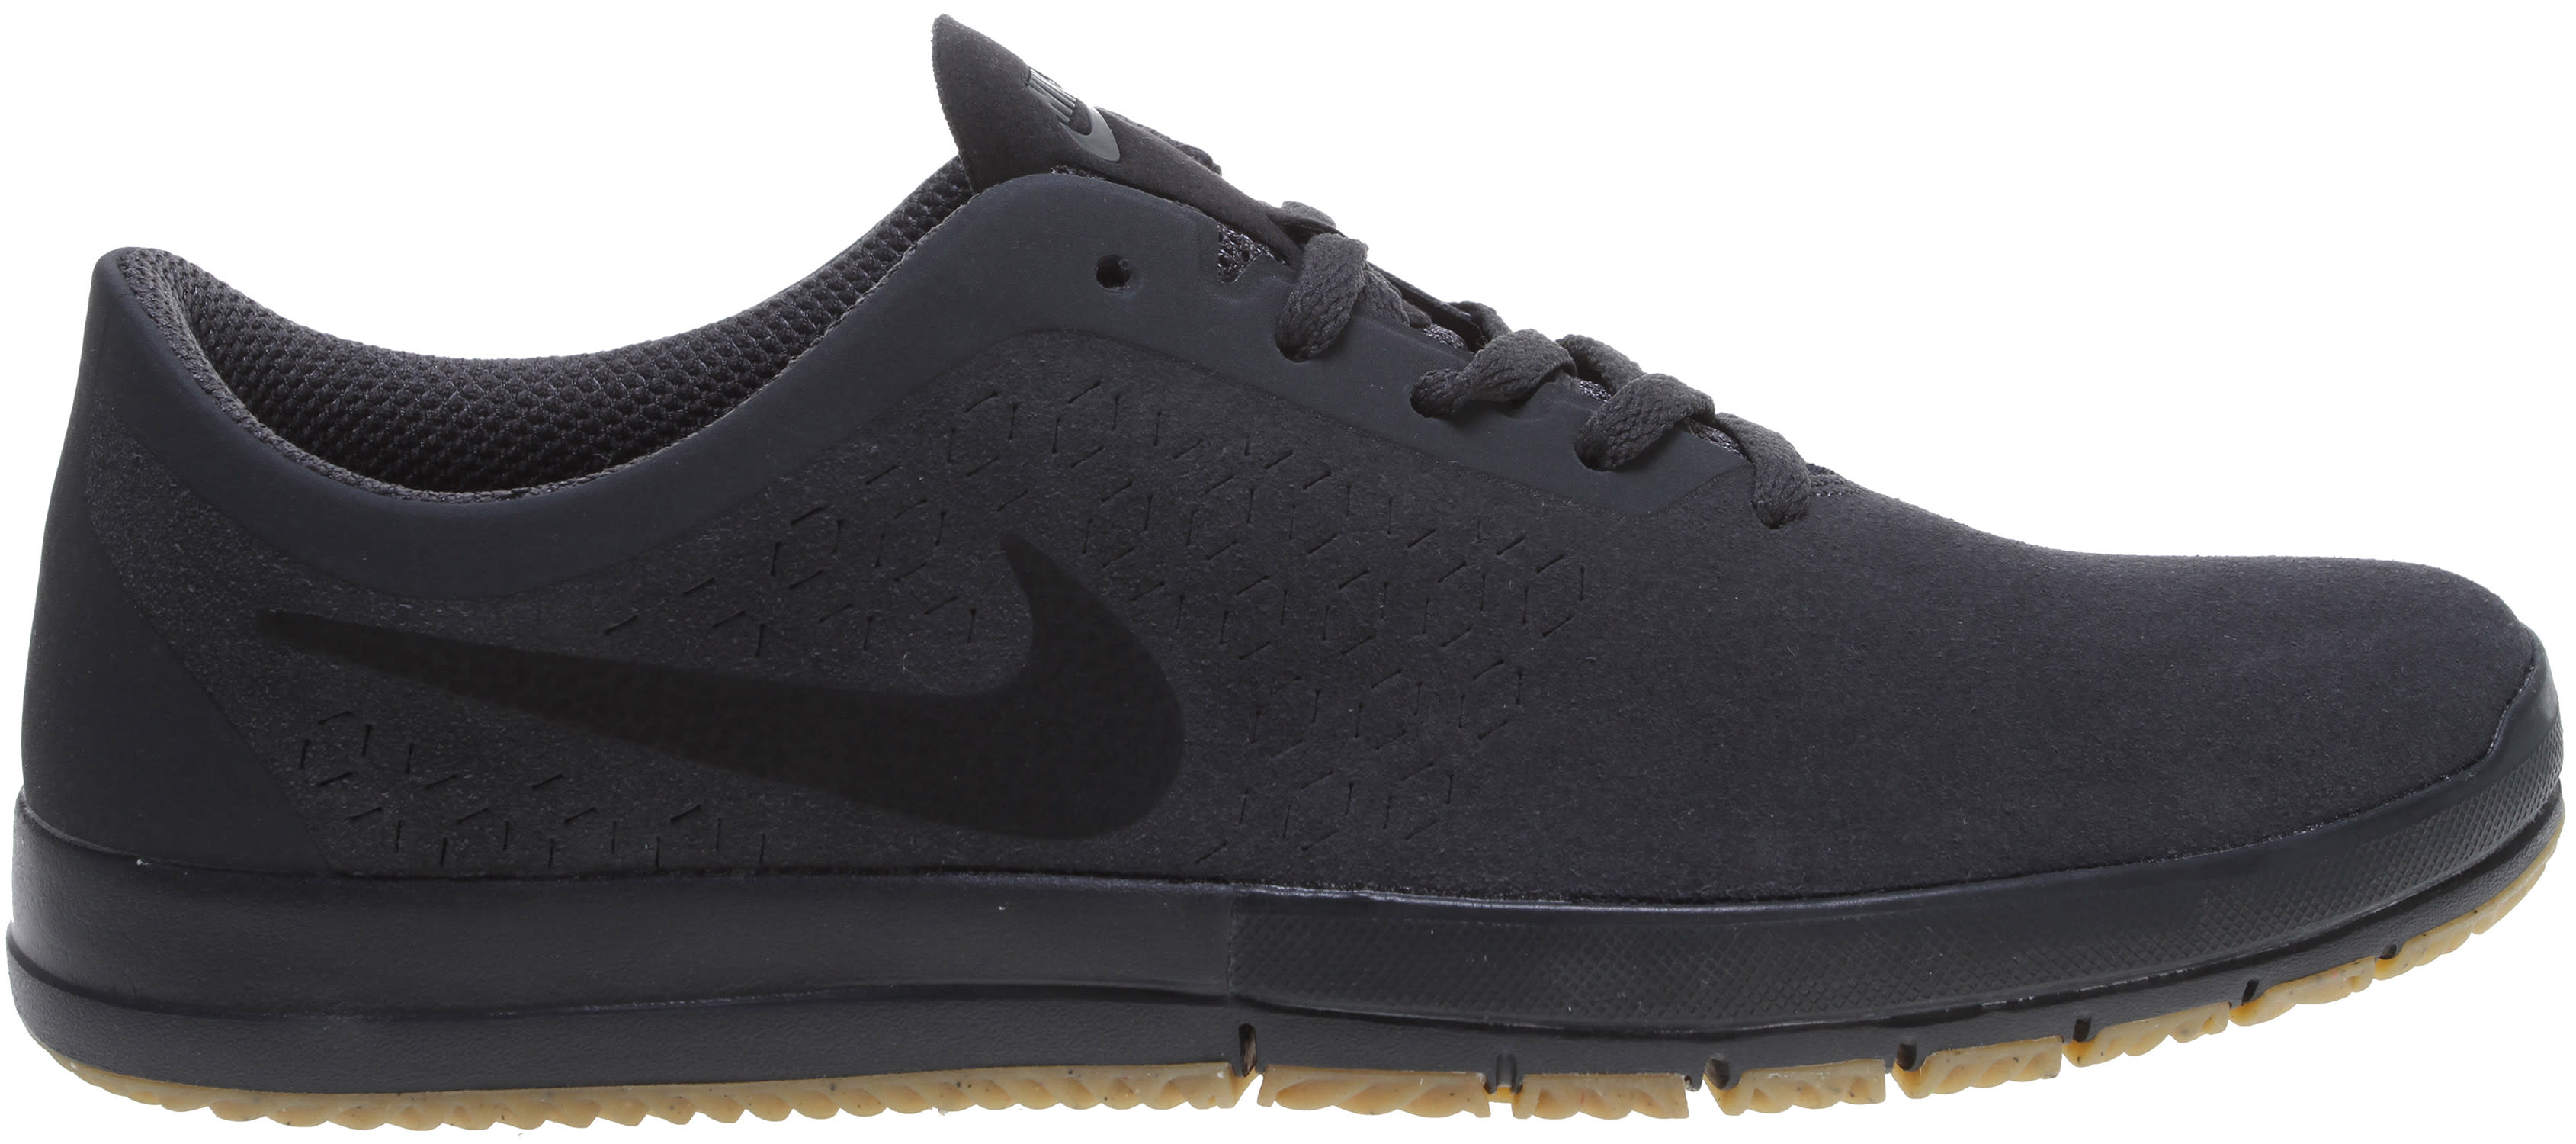 wholesale dealer 11d56 9de2d Nike Free SB Nano Skate Shoes - thumbnail 1